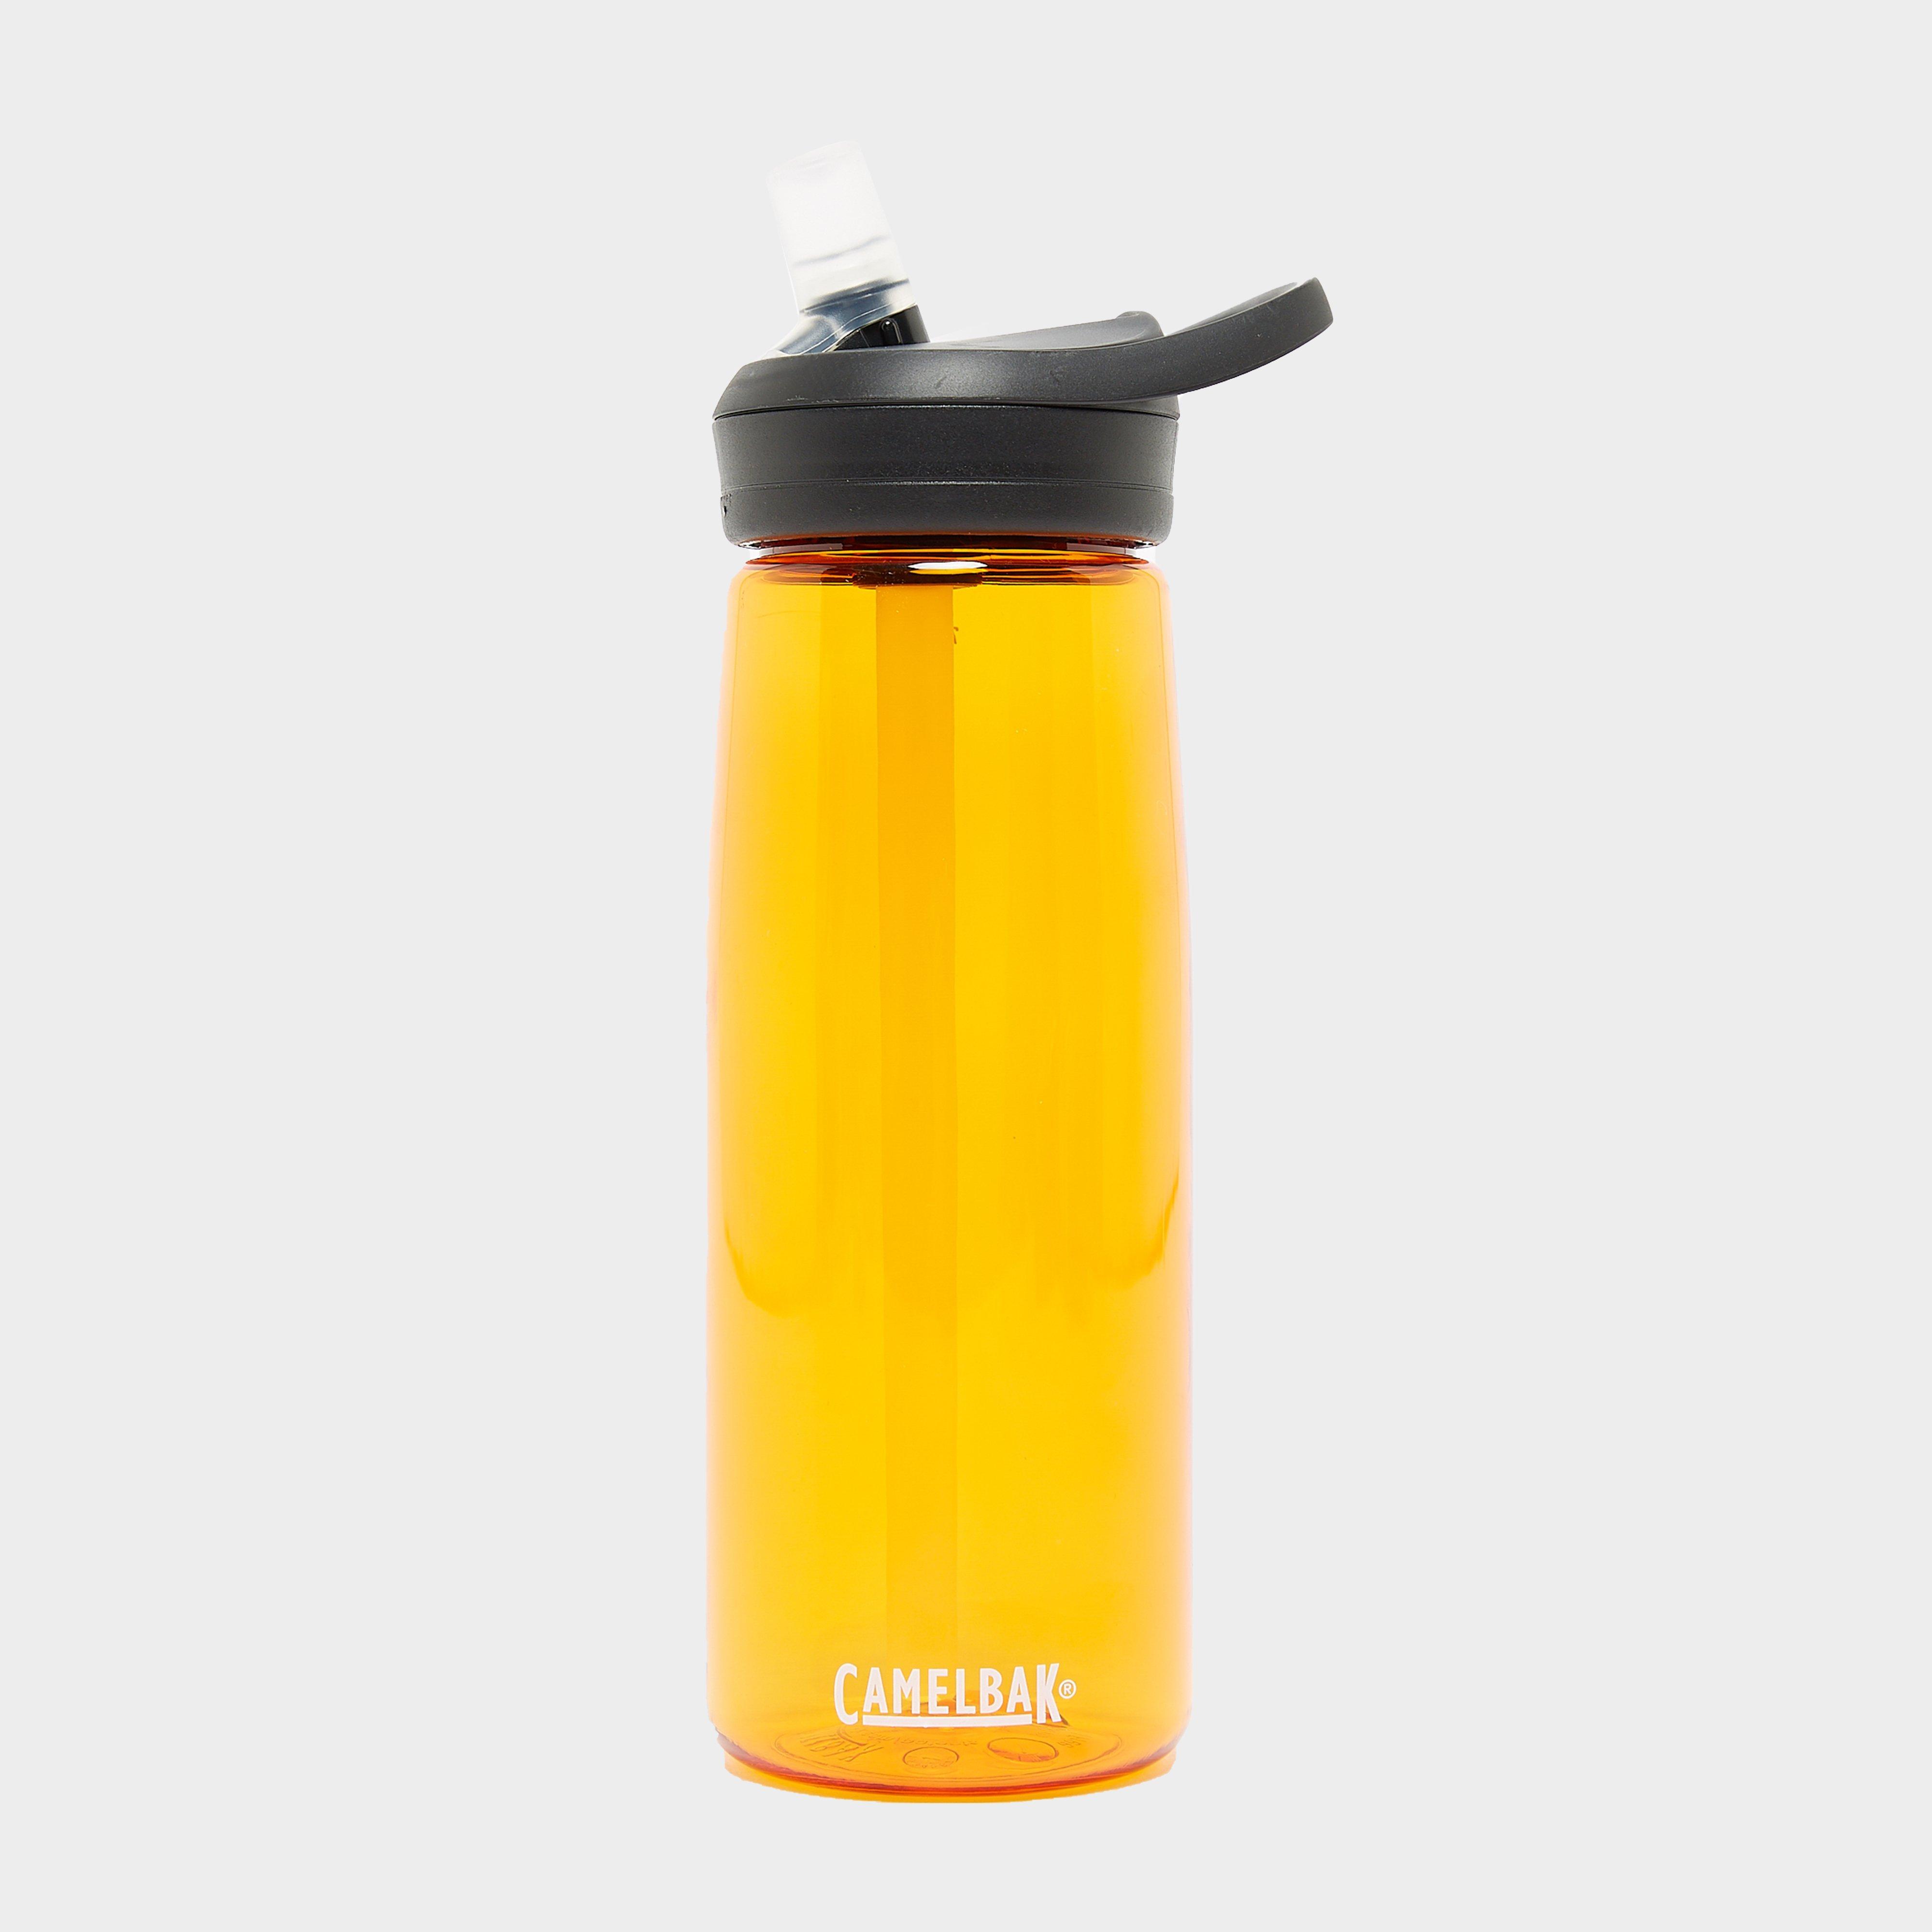 Camelbak 0.75L Eddy+ Water Bottle, Orange/LAVA